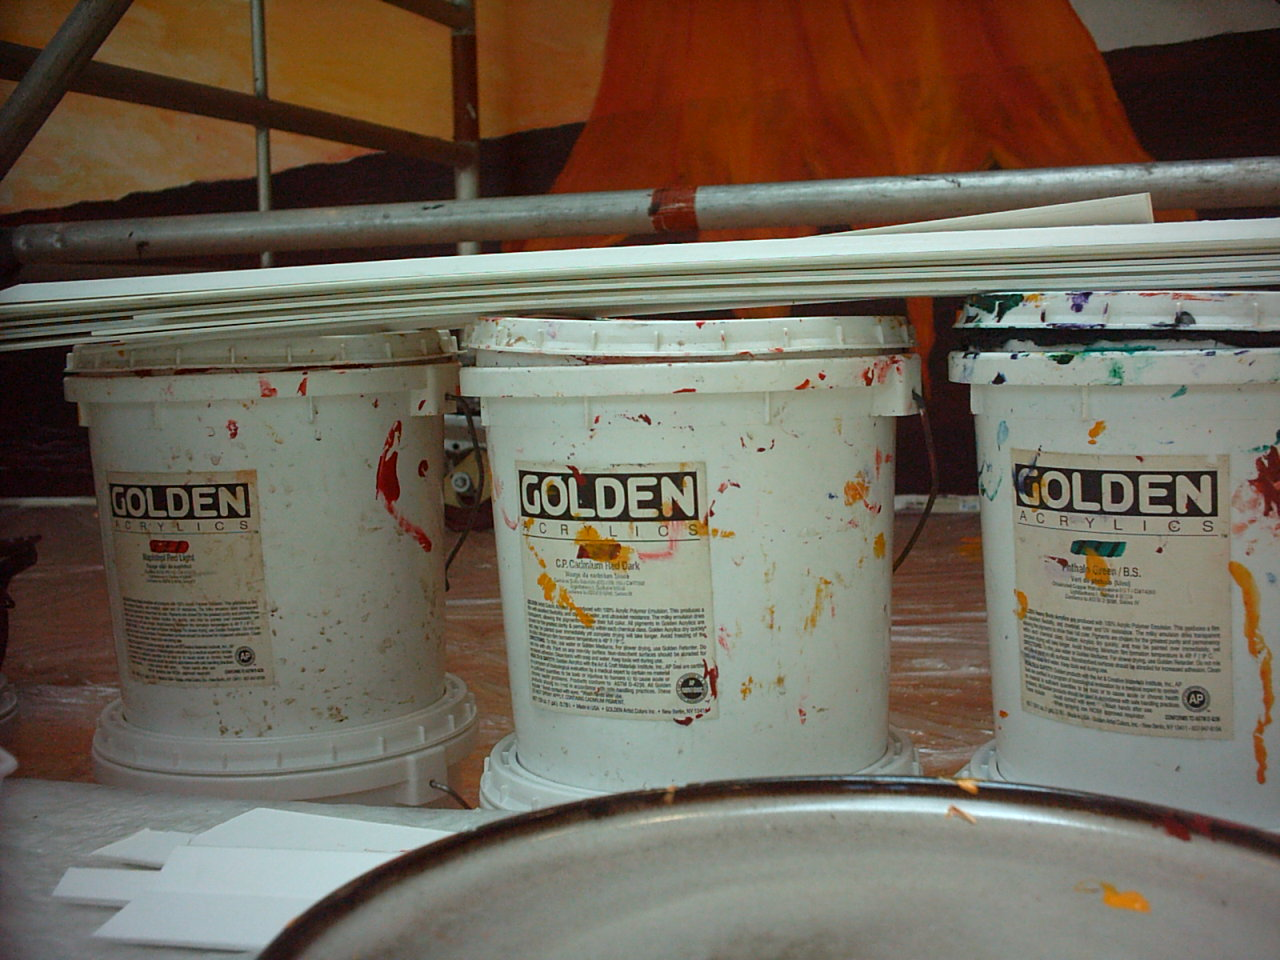 Golden acrylic paint